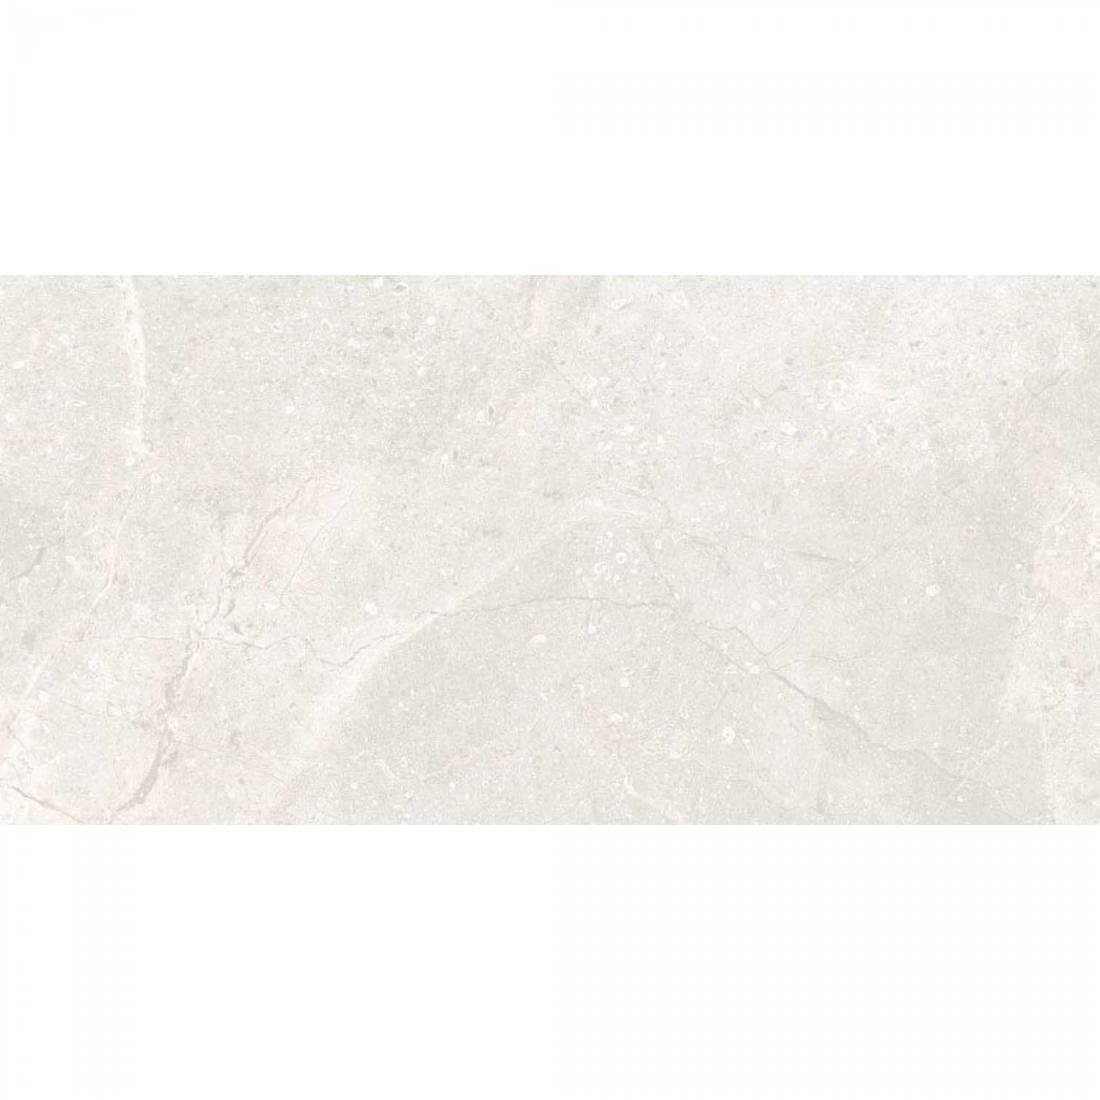 Rivoli 30x60 Perla Gloss 1